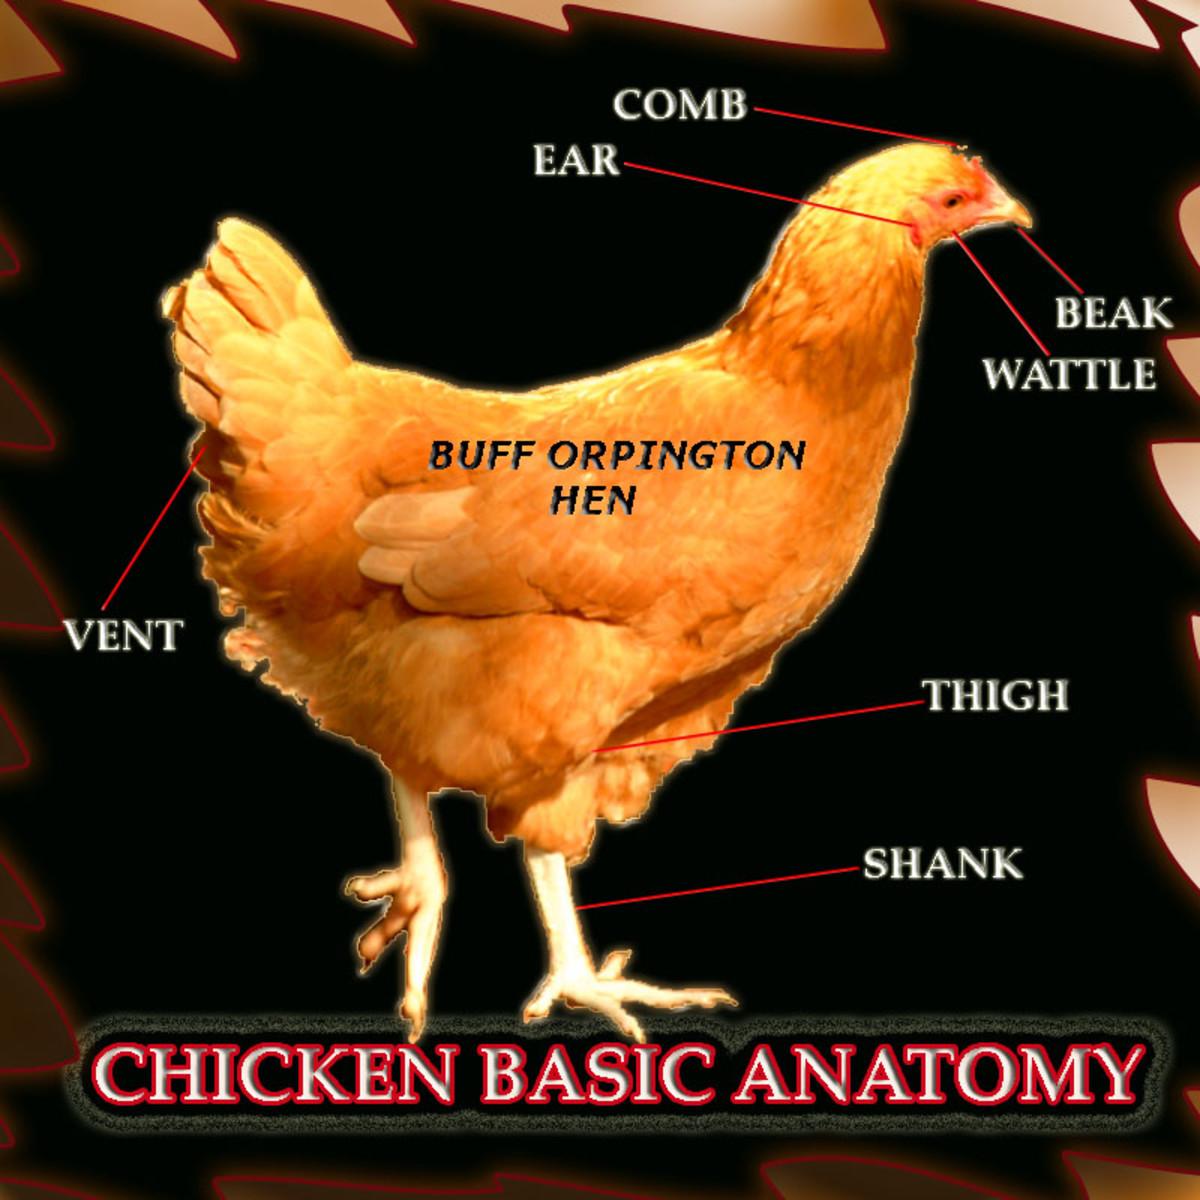 Diagram of basic chicken anatomy